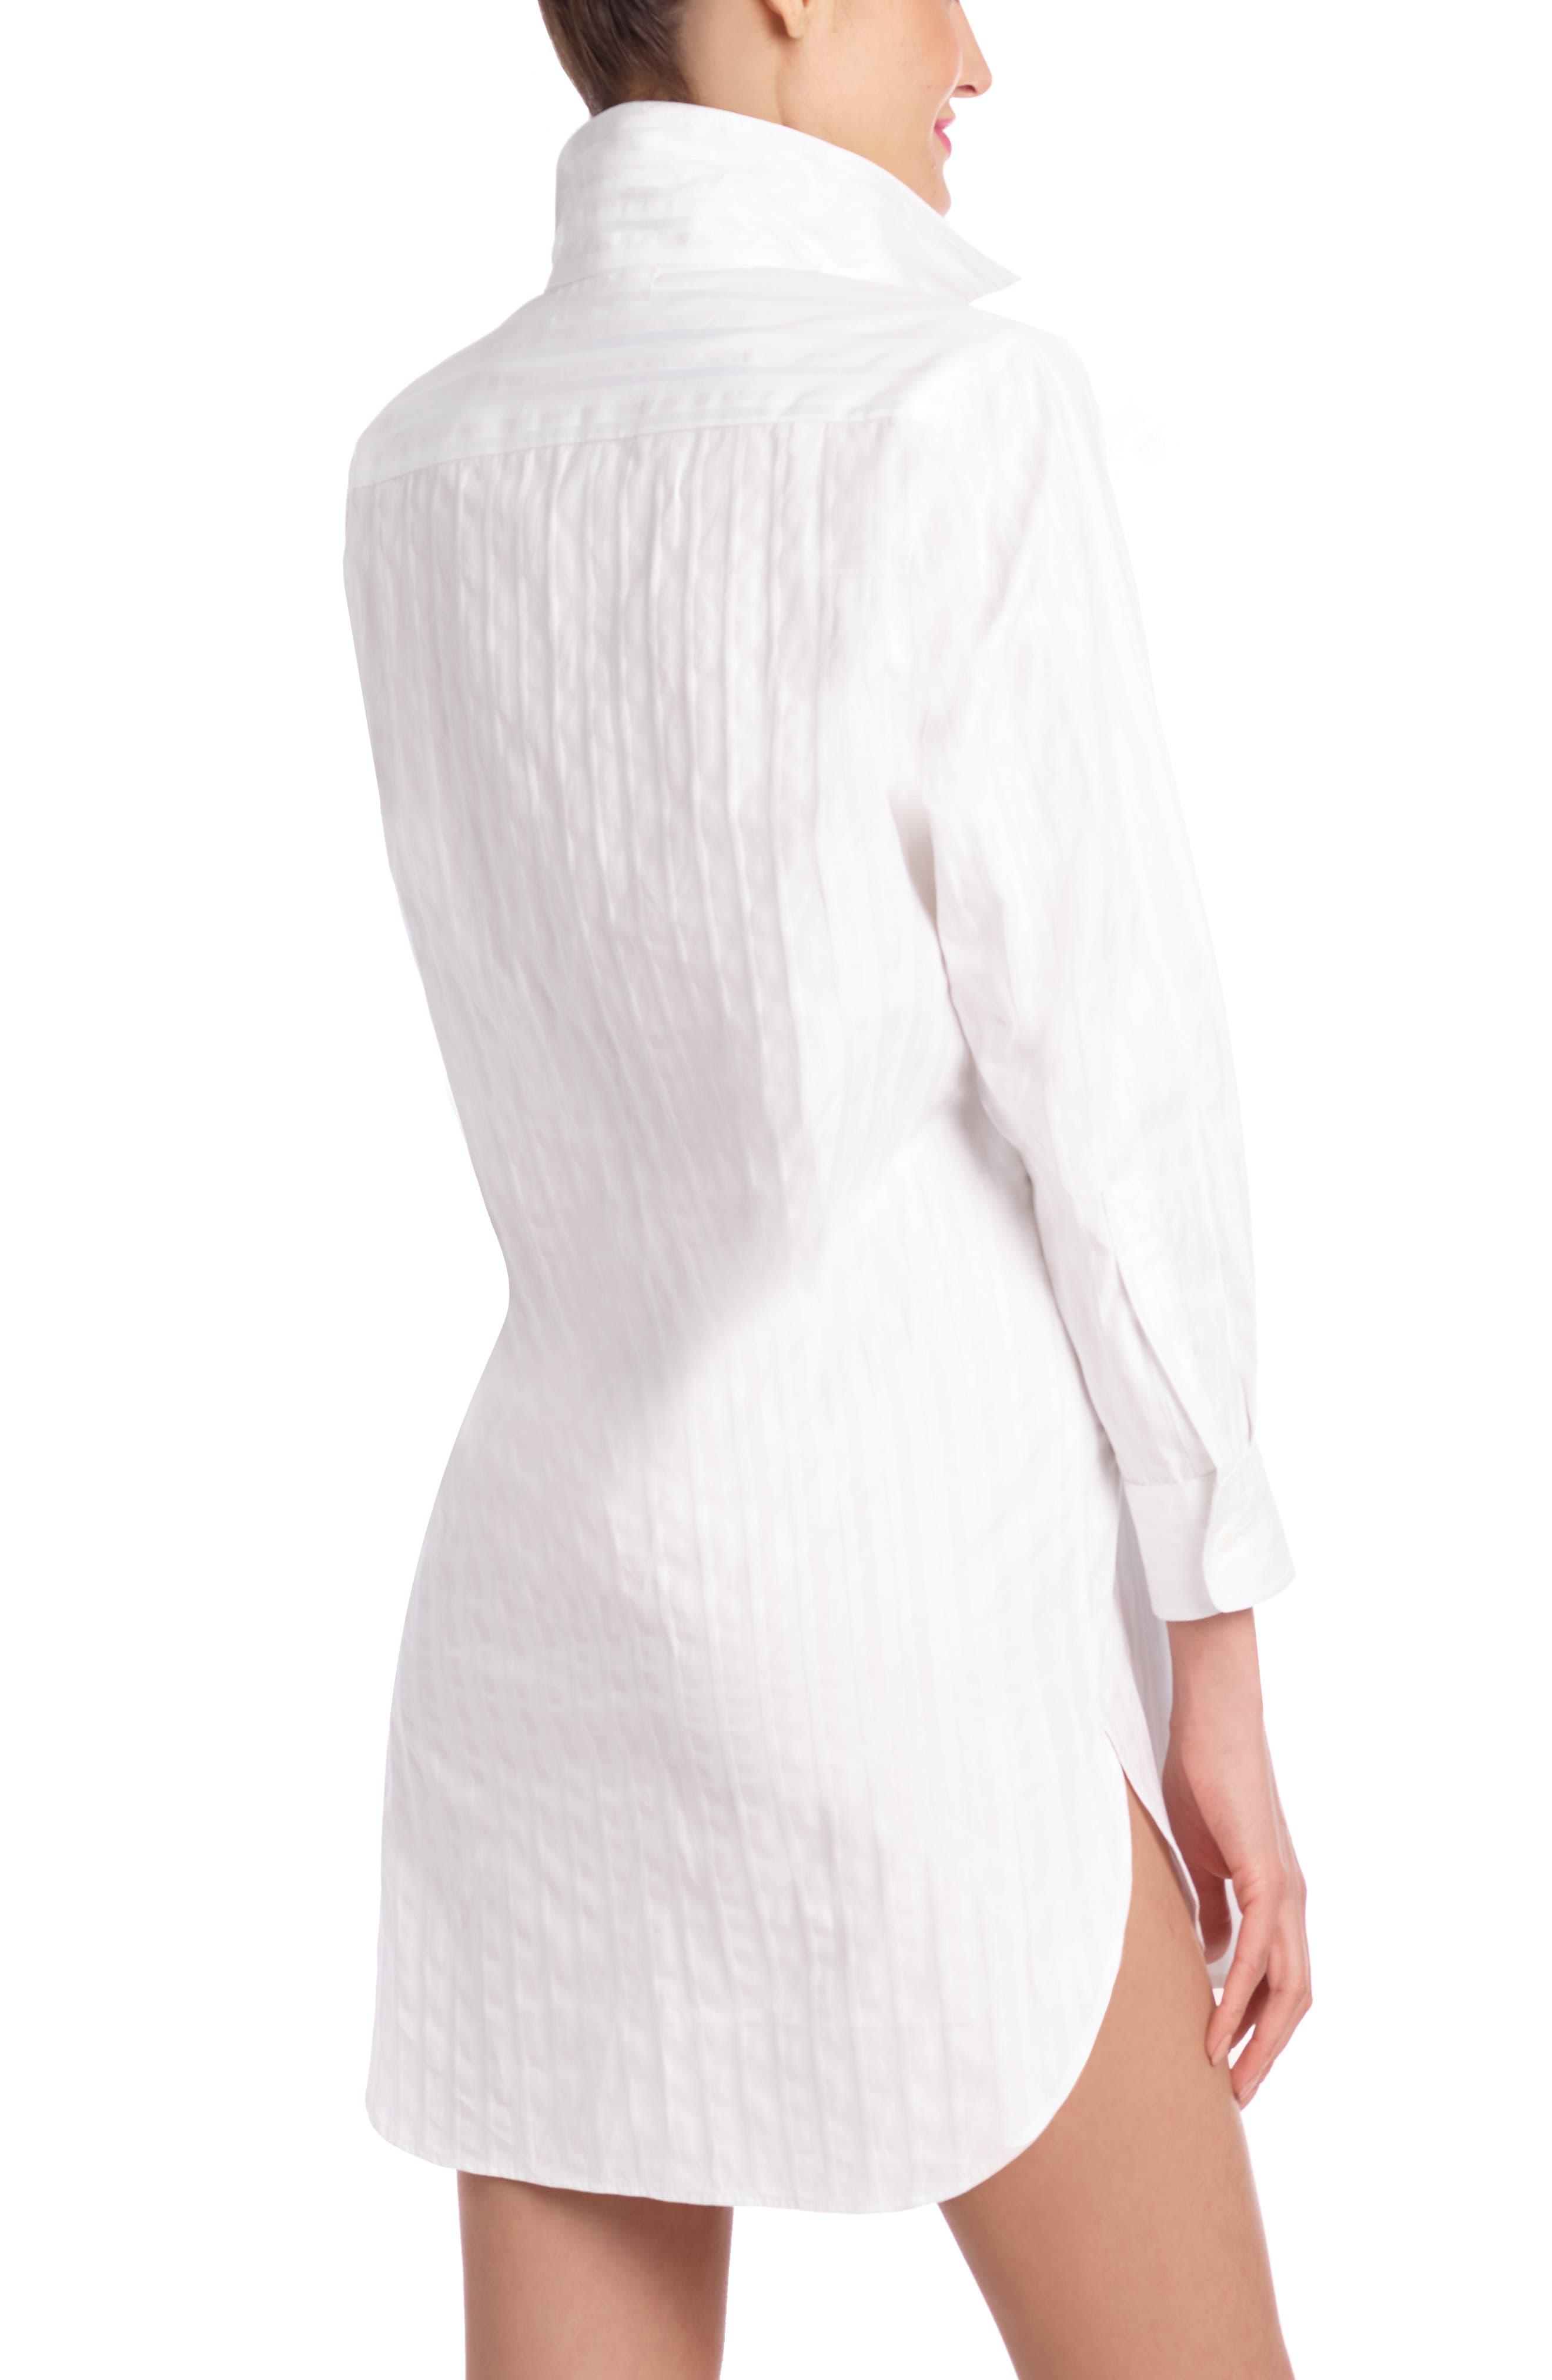 Stripe Oversize Sleep Shirt,                             Alternate thumbnail 2, color,                             JACQUARD STRIPE WHITE